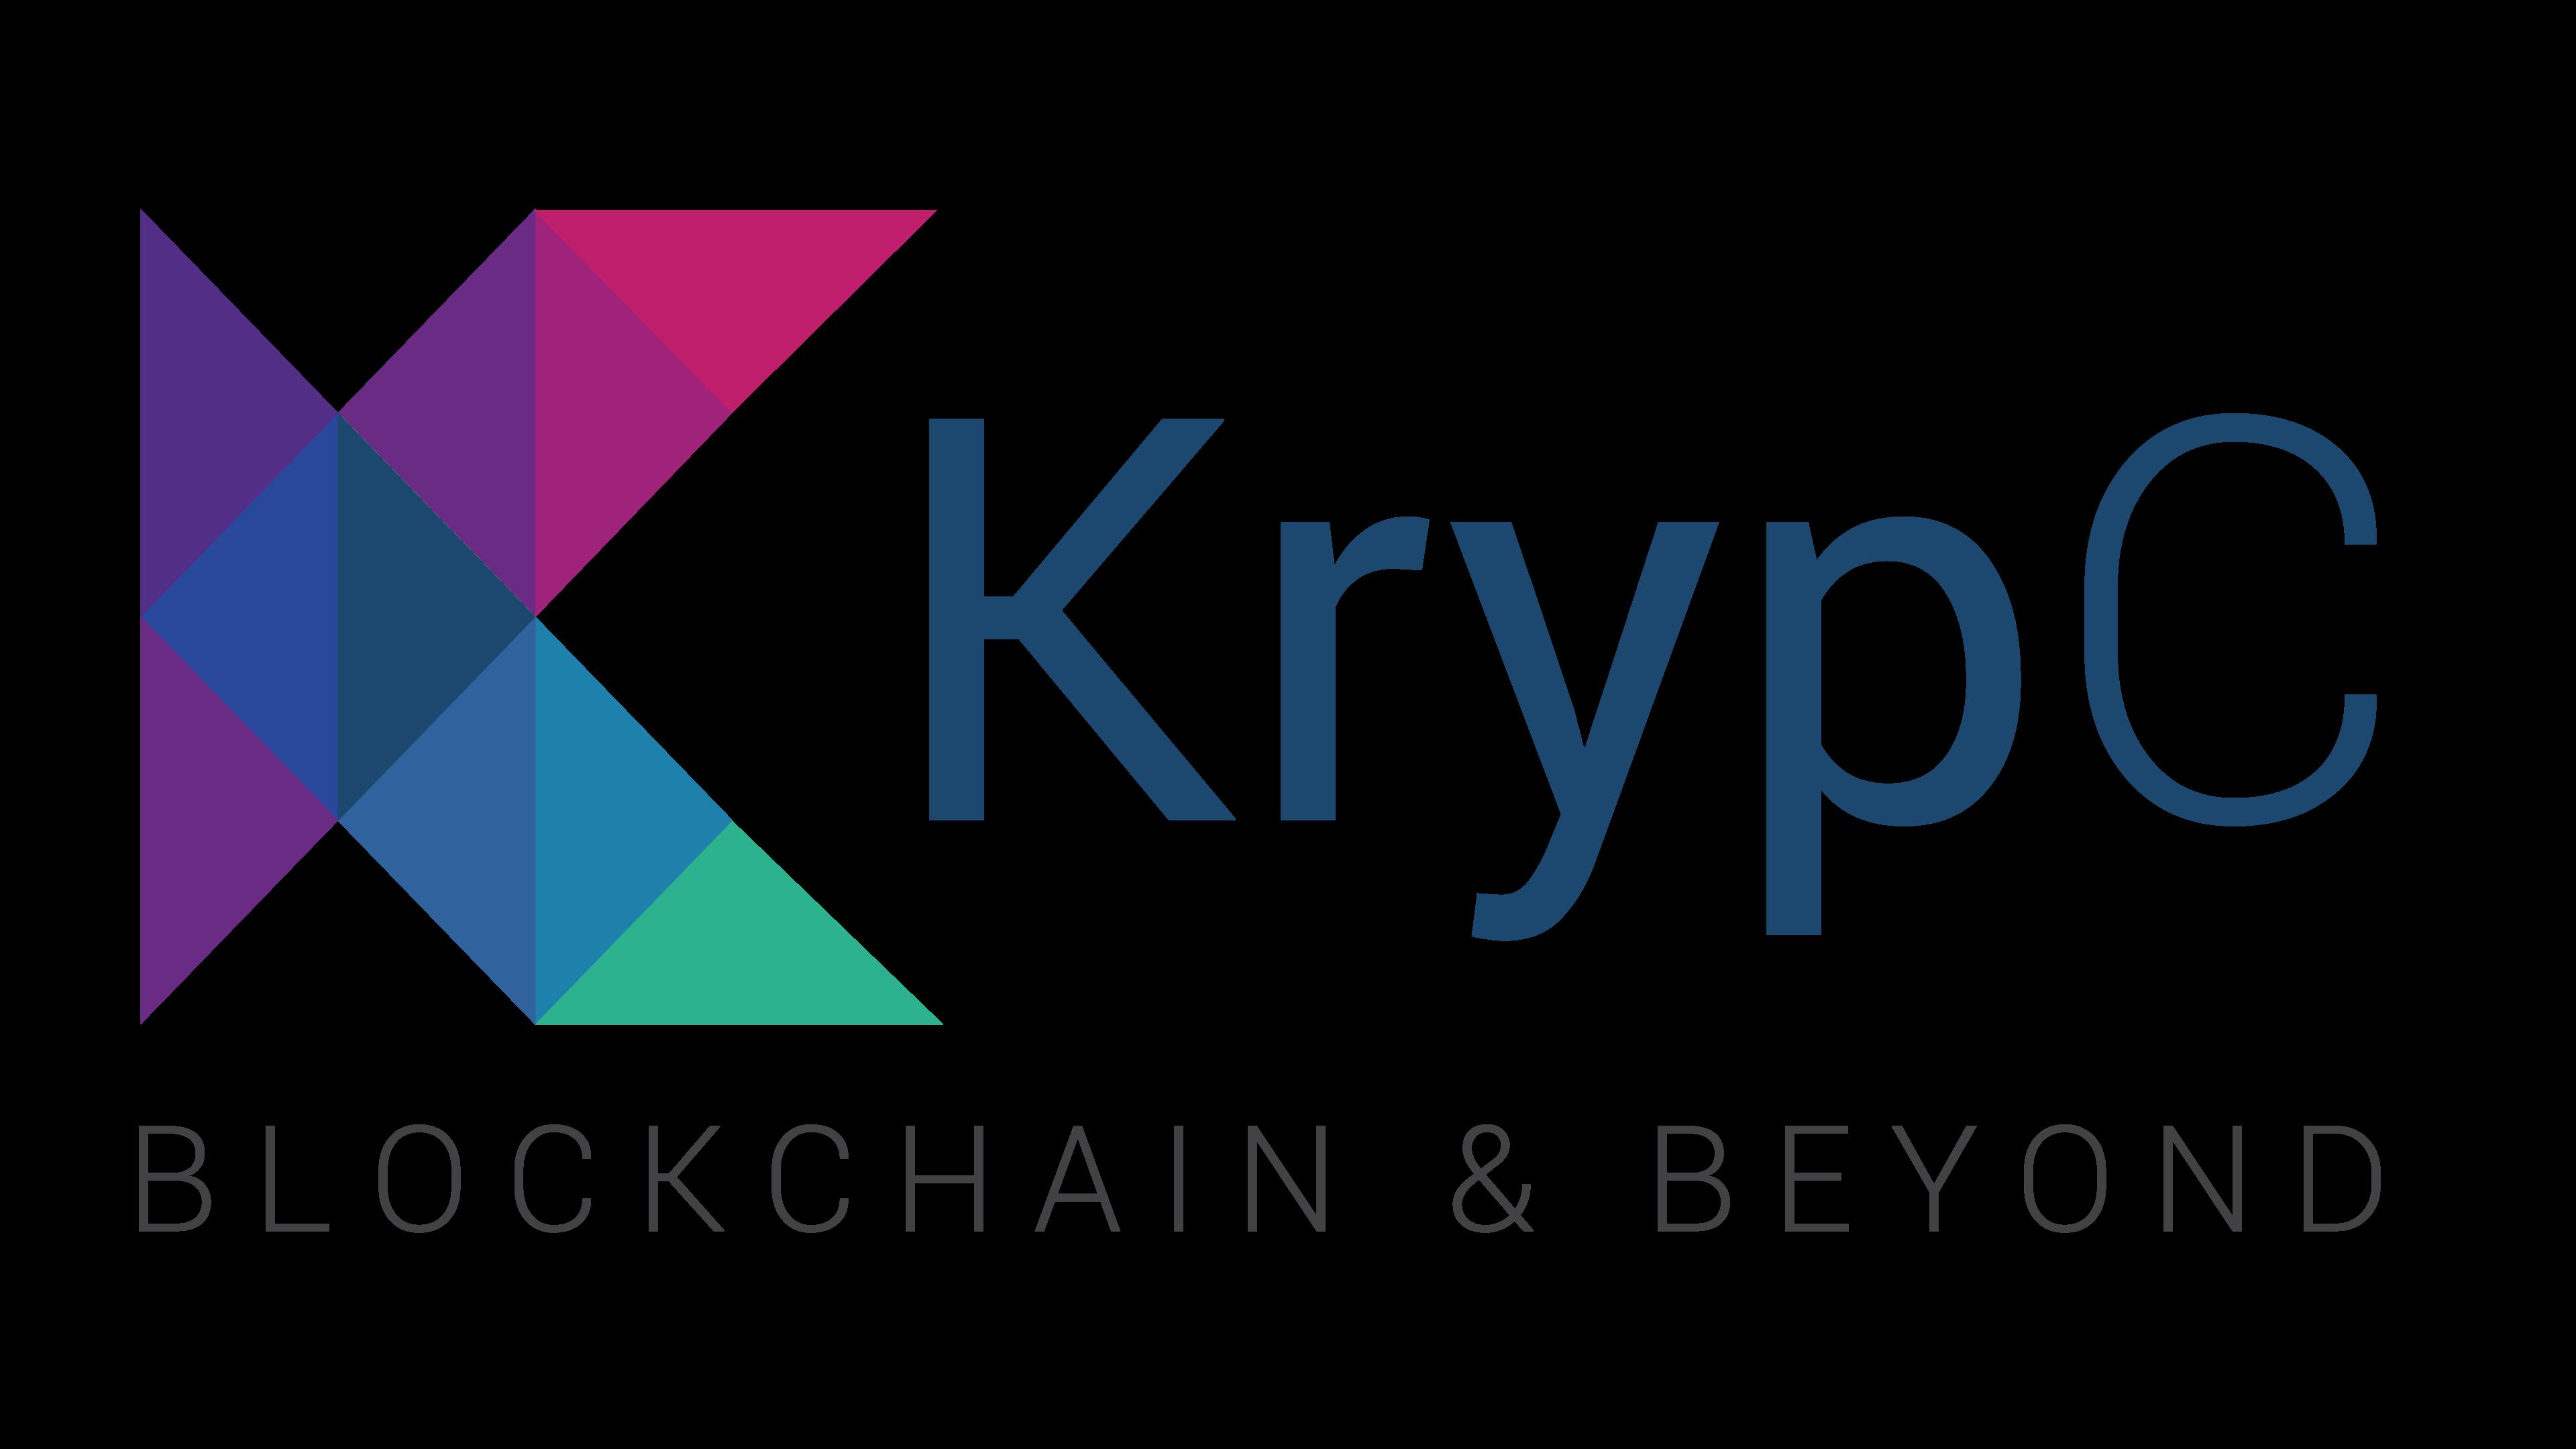 Krypc Technologies Inc.